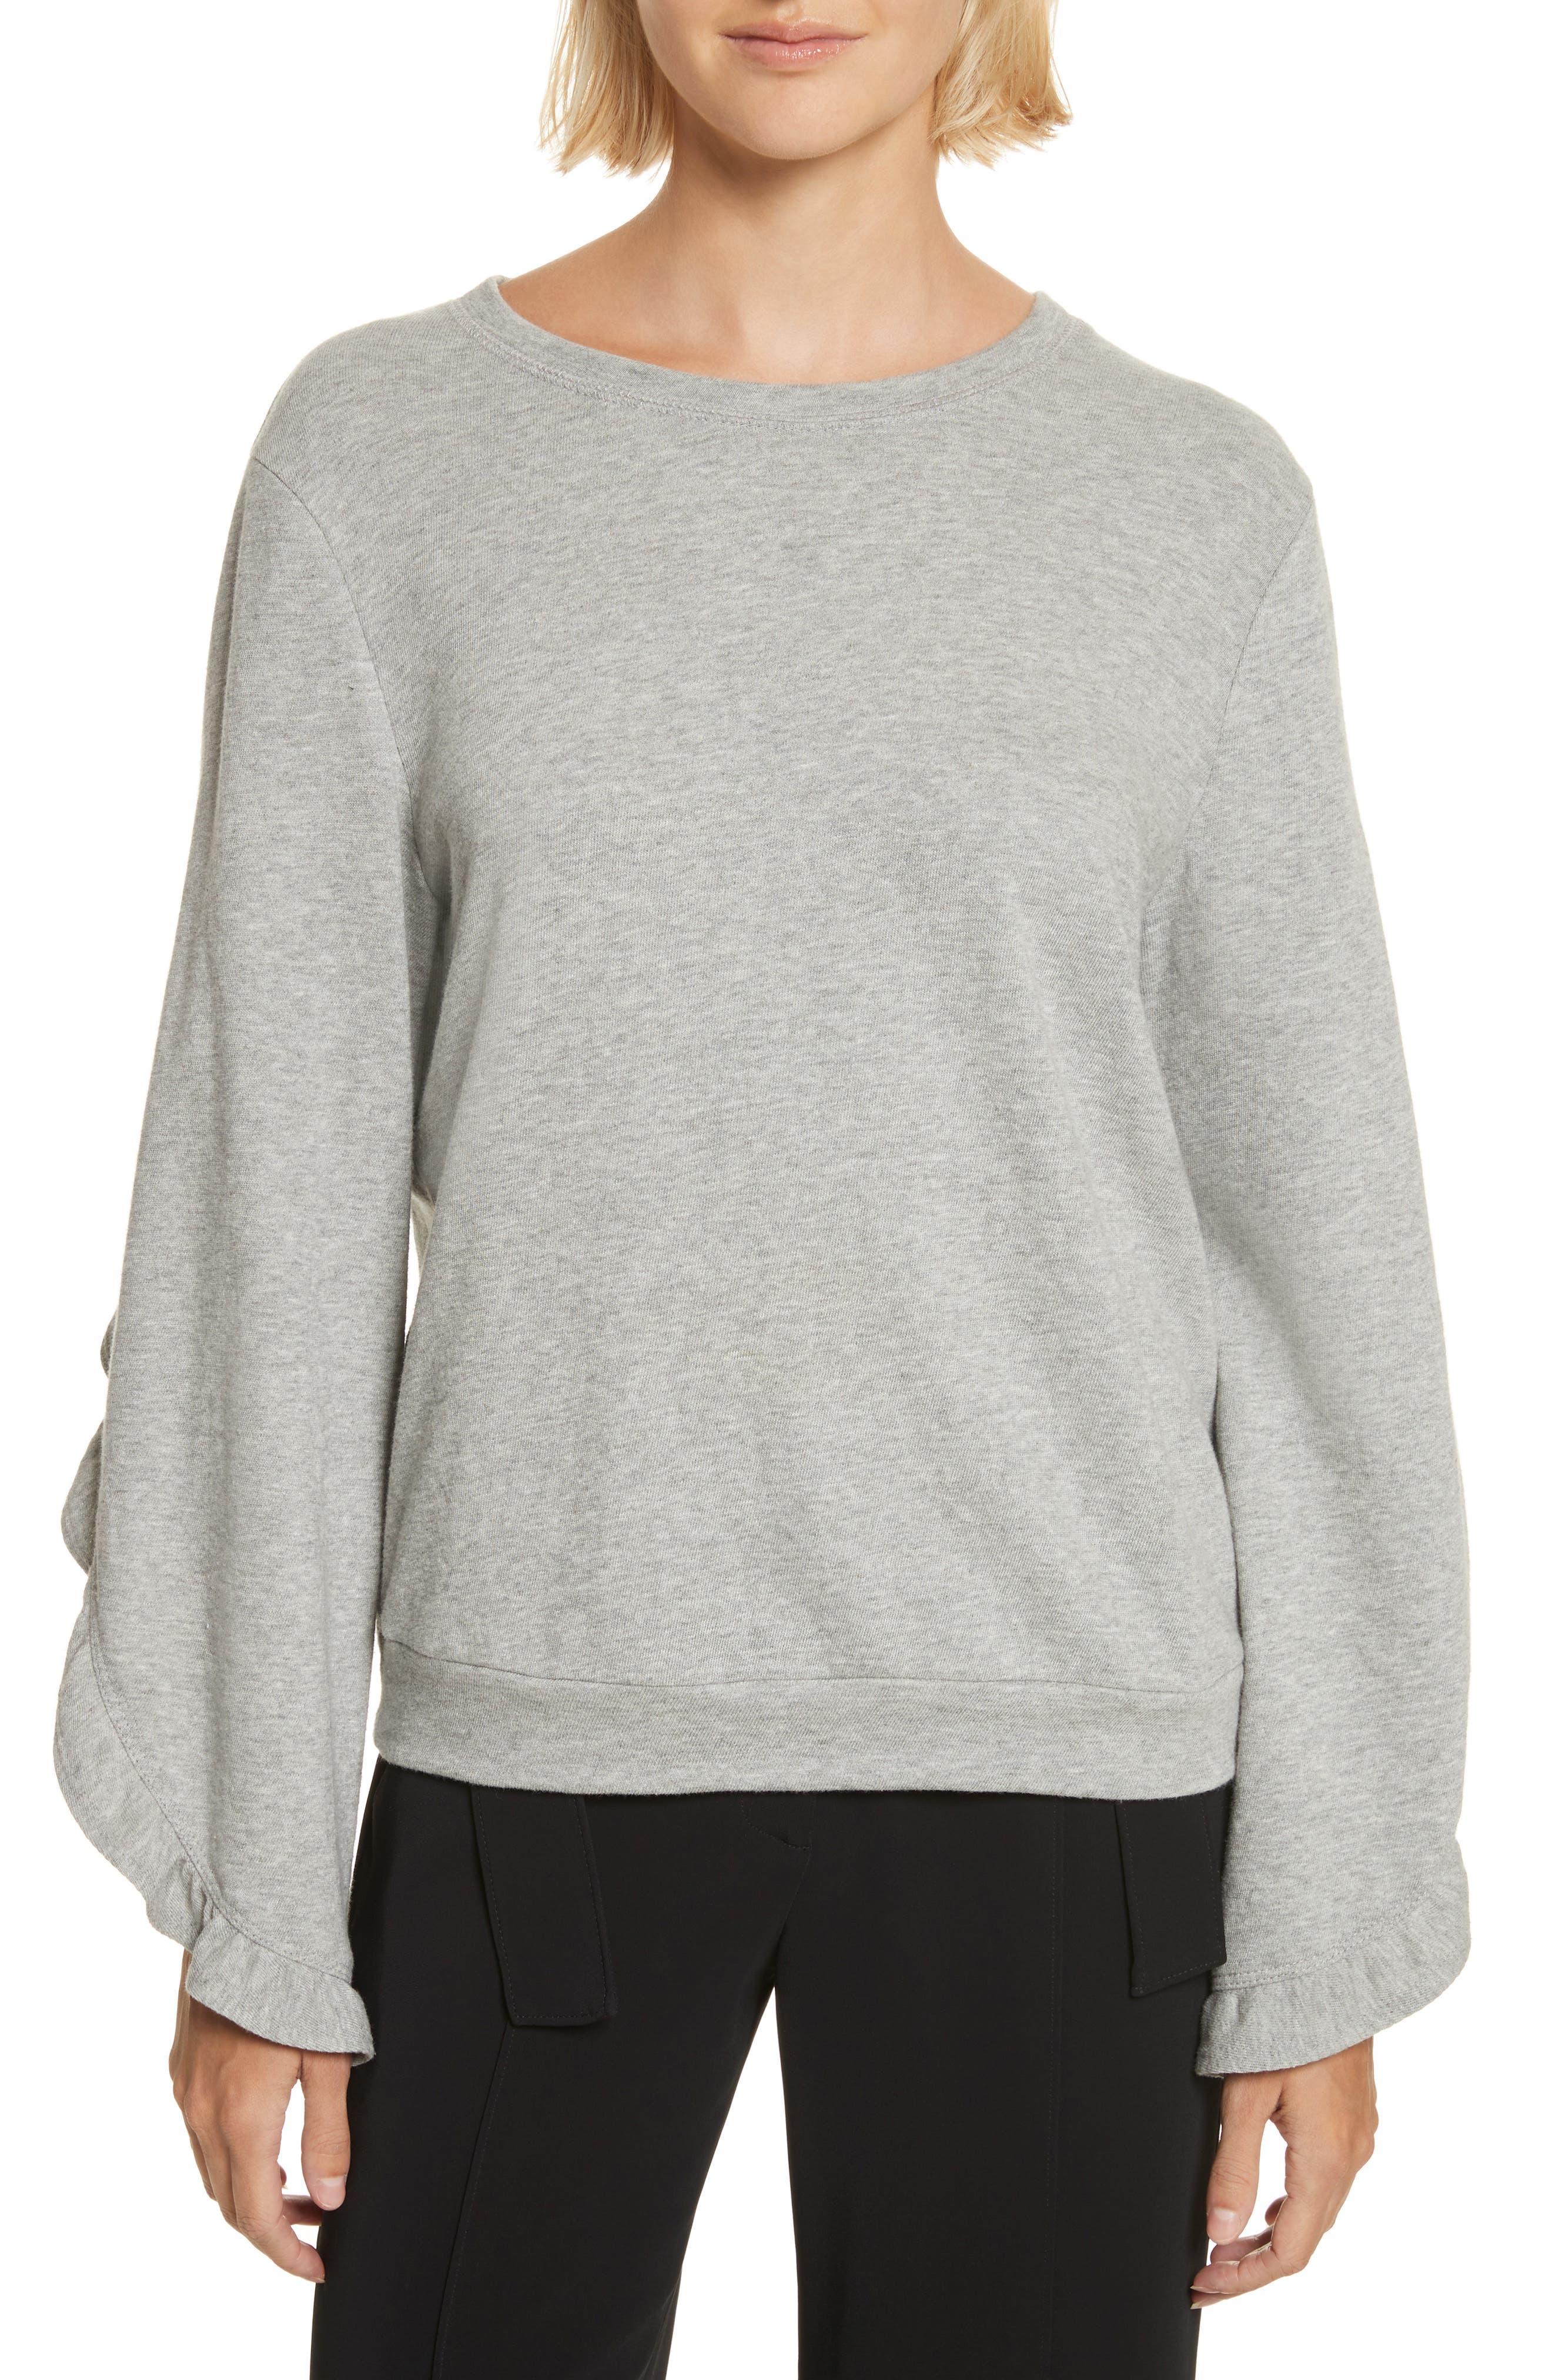 Camden Ruffle Sleeve Top,                         Main,                         color, Heather Grey